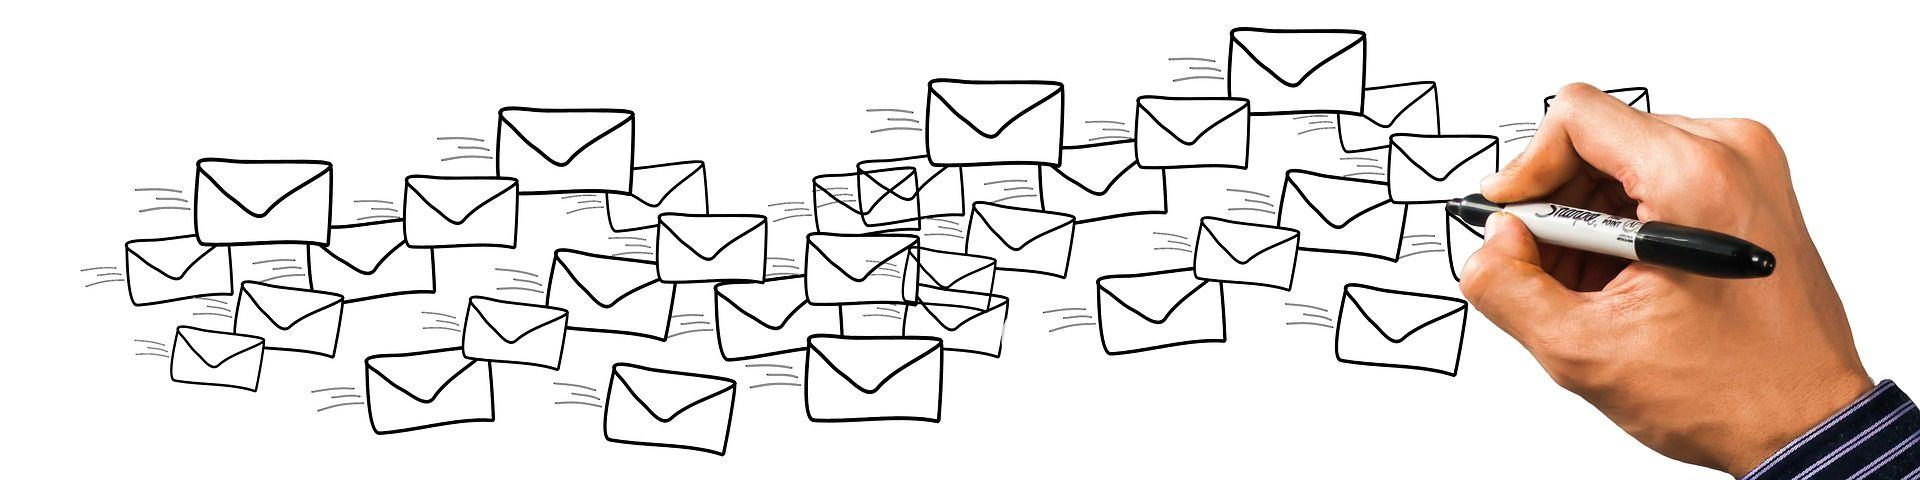 Nachrichten an potentielle Bewerber per XING und LinkedIn